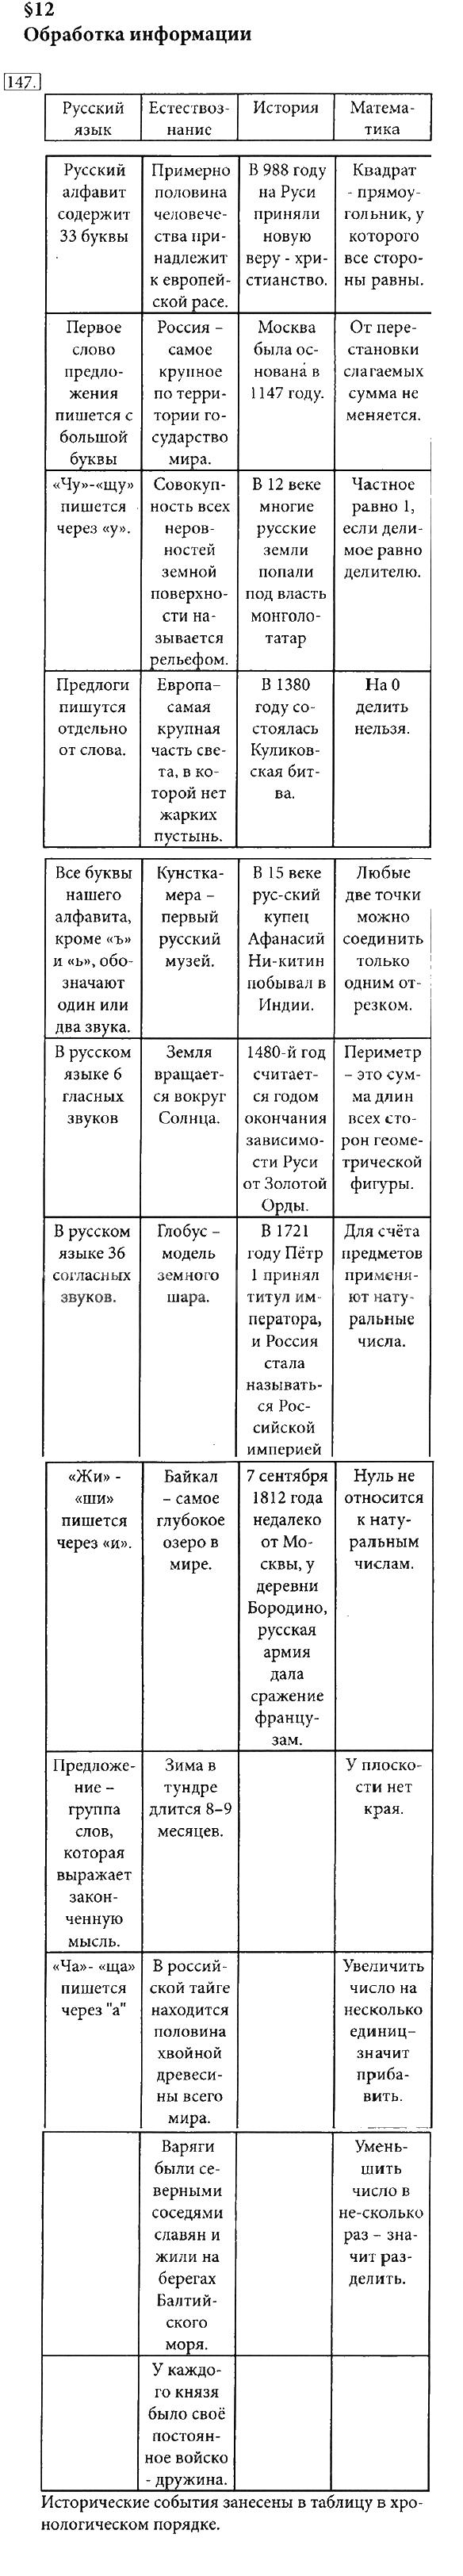 Гдз по химии класс автор кузнецова